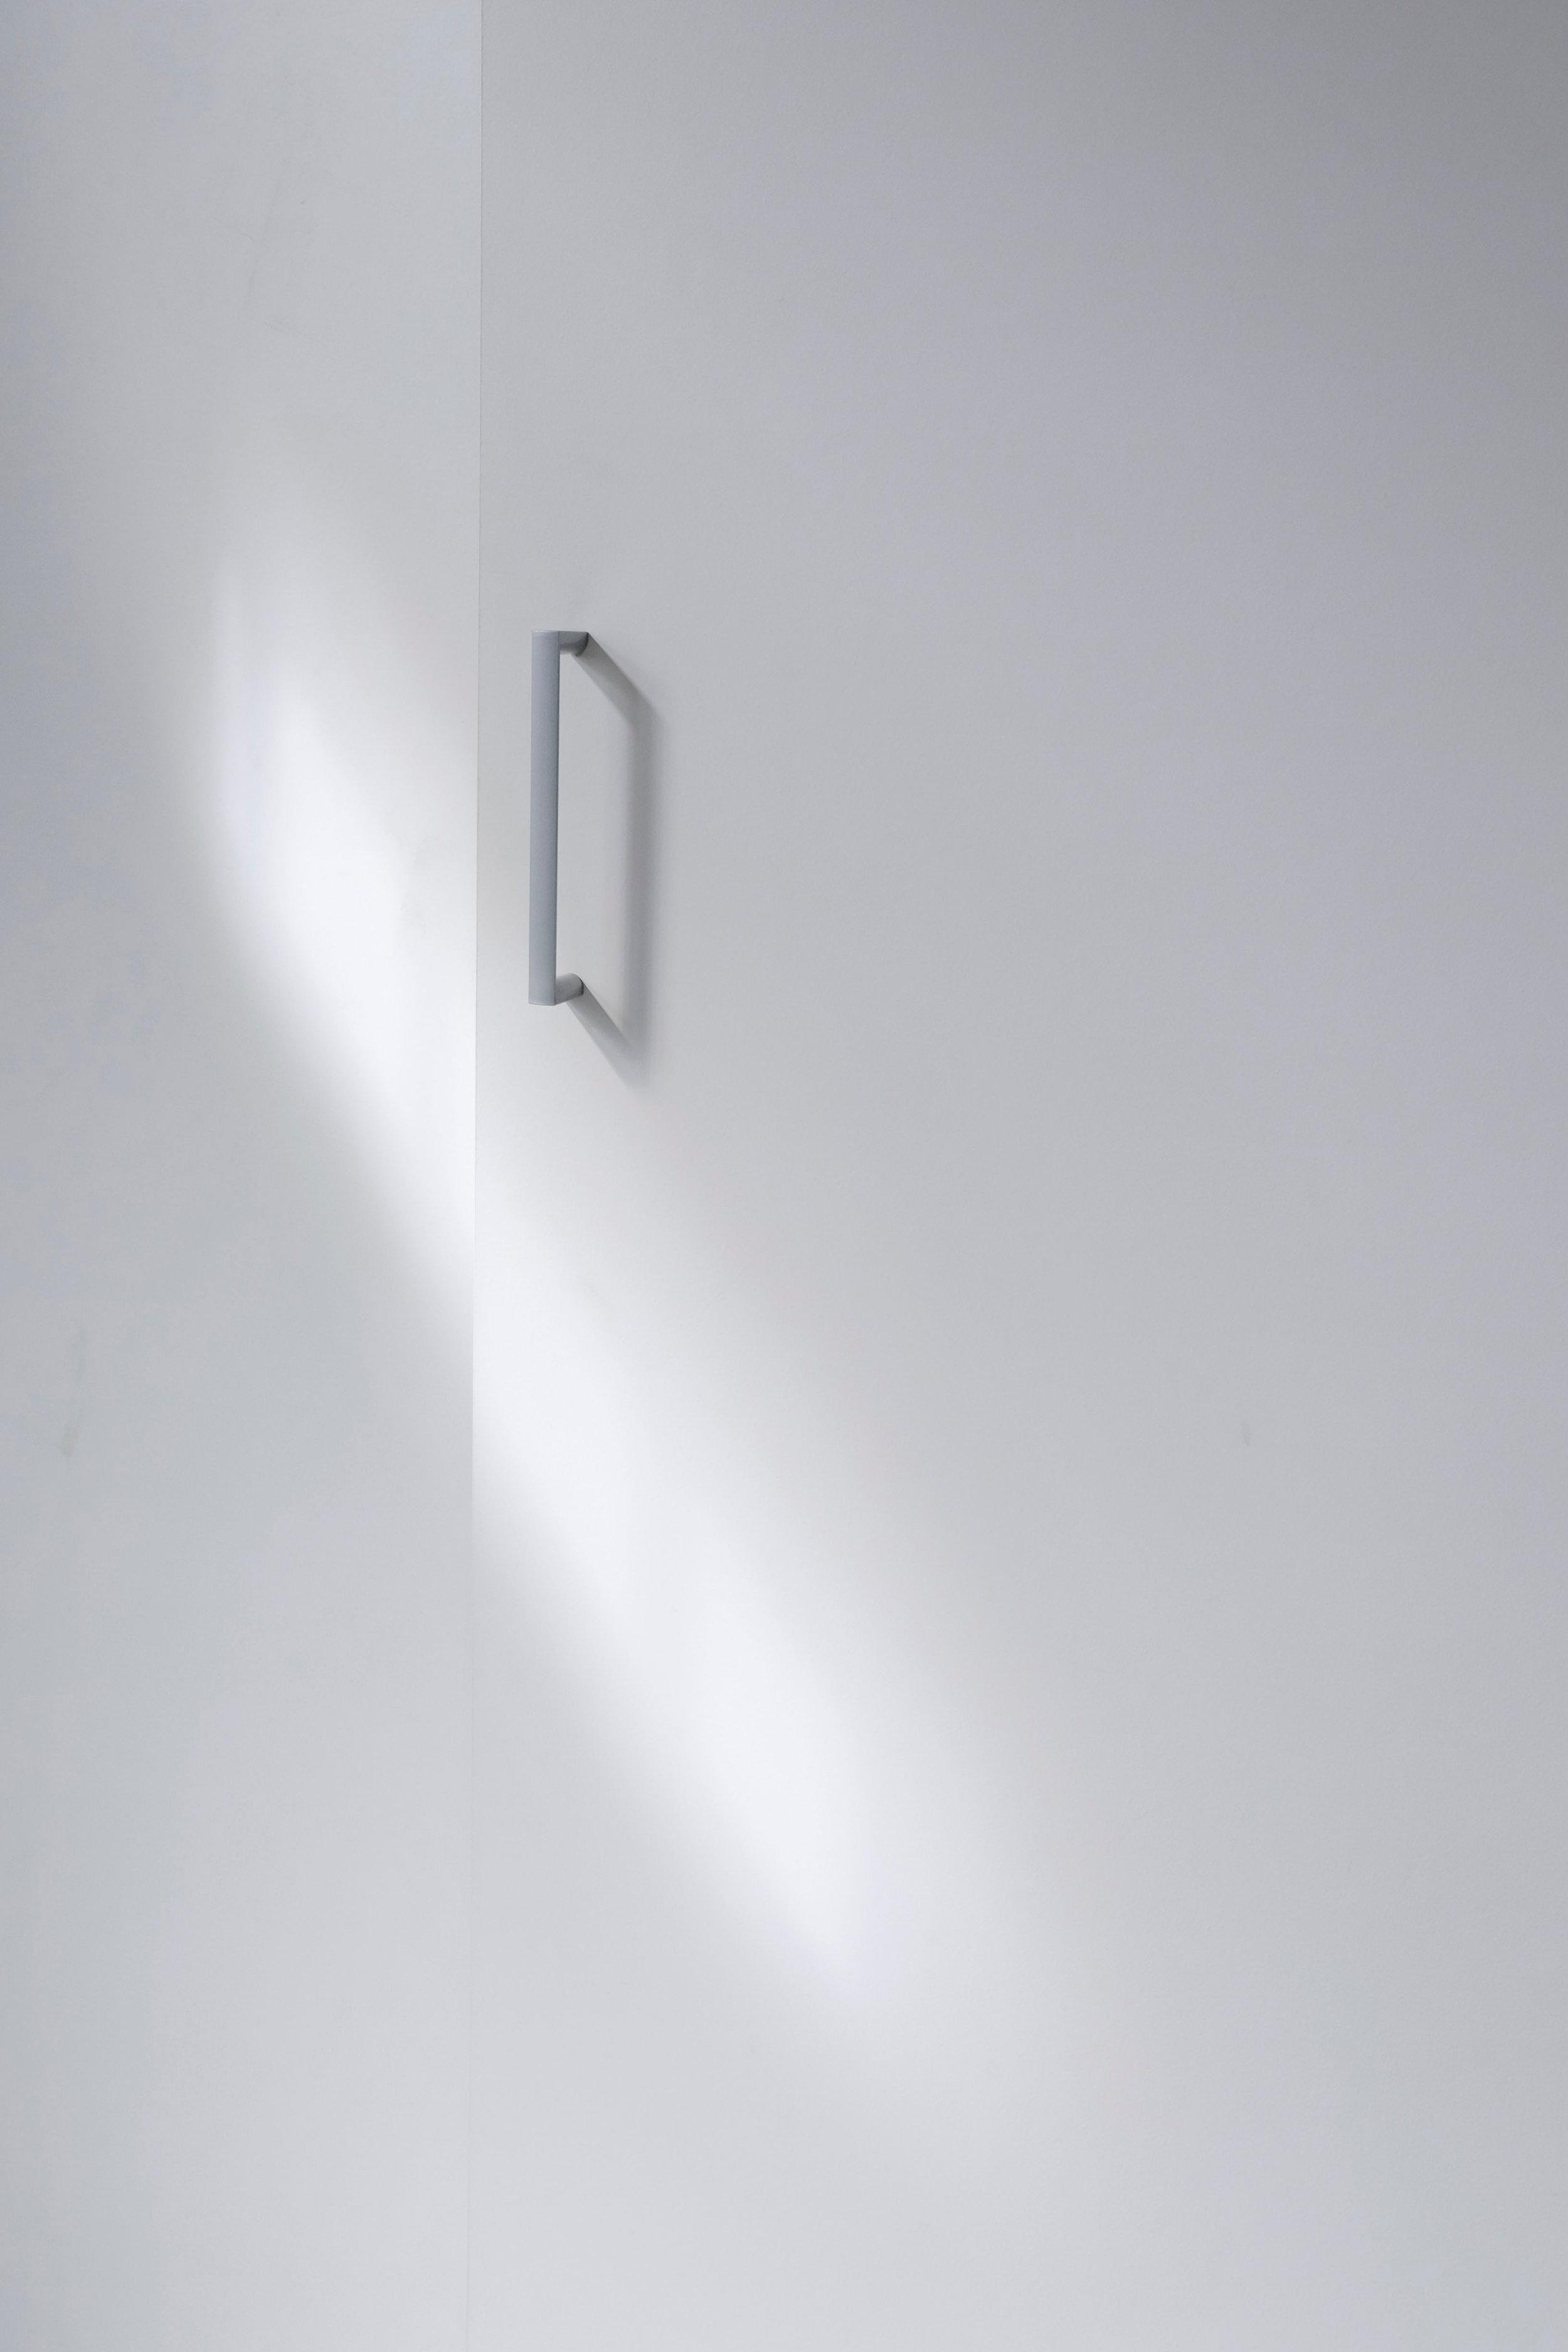 Minimalist lifestyle article. Image of white, minimalist handle.jpg